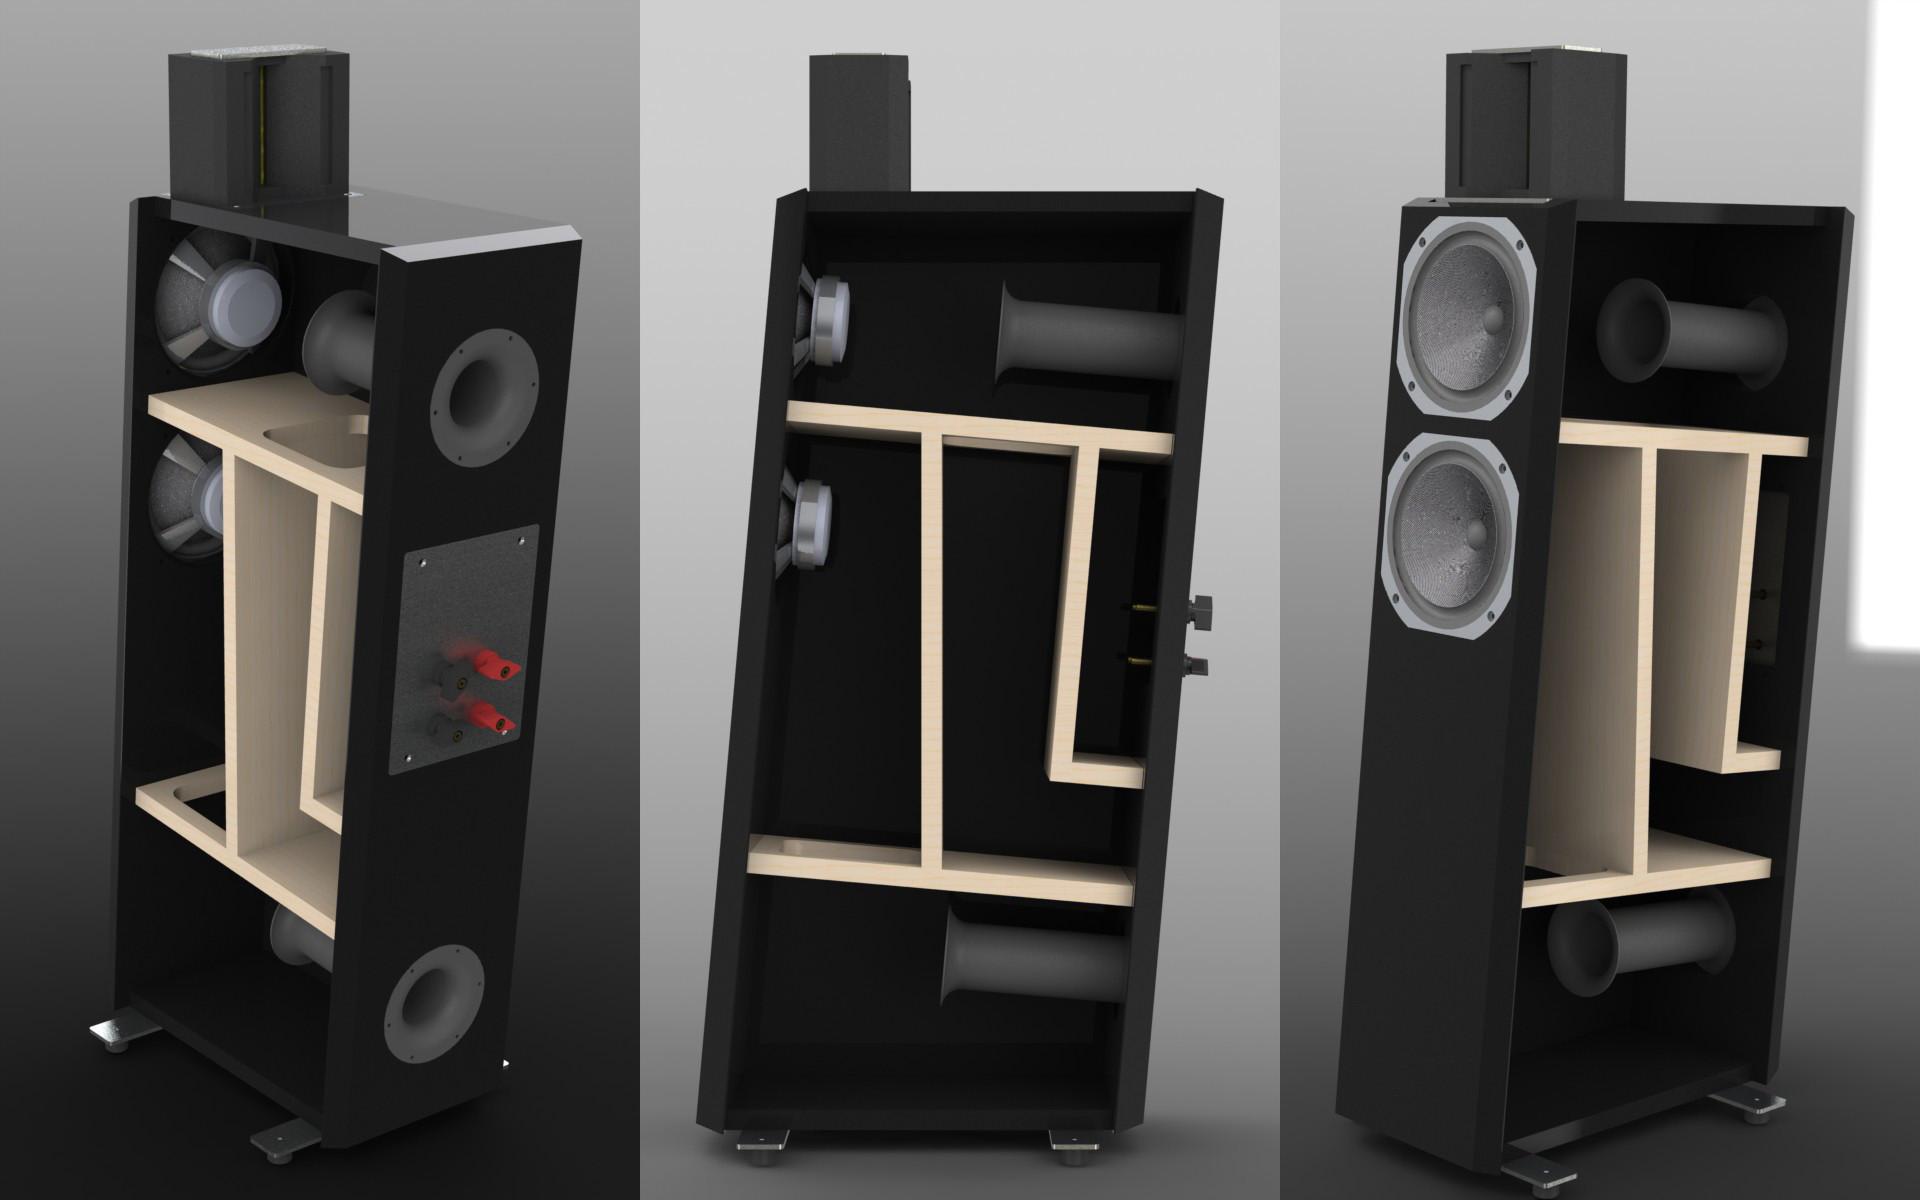 Diy Lautsprecher  Klang Ton Forum • Thema anzeigen [B] DIY Lautsprecher